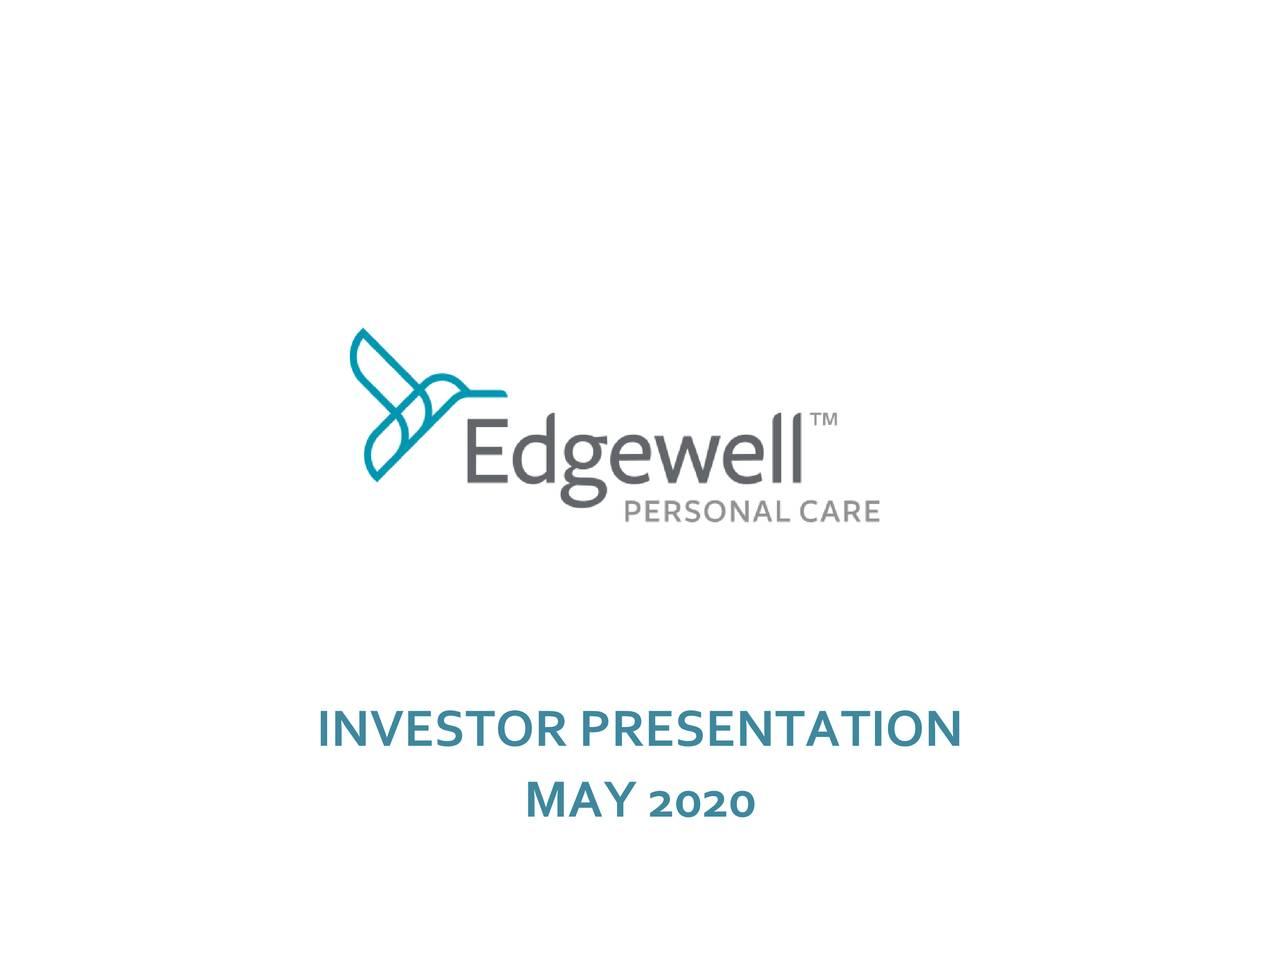 Edgewell Personal Care (EPC) Investor Presentation - Slideshow (NYSE:EPC)